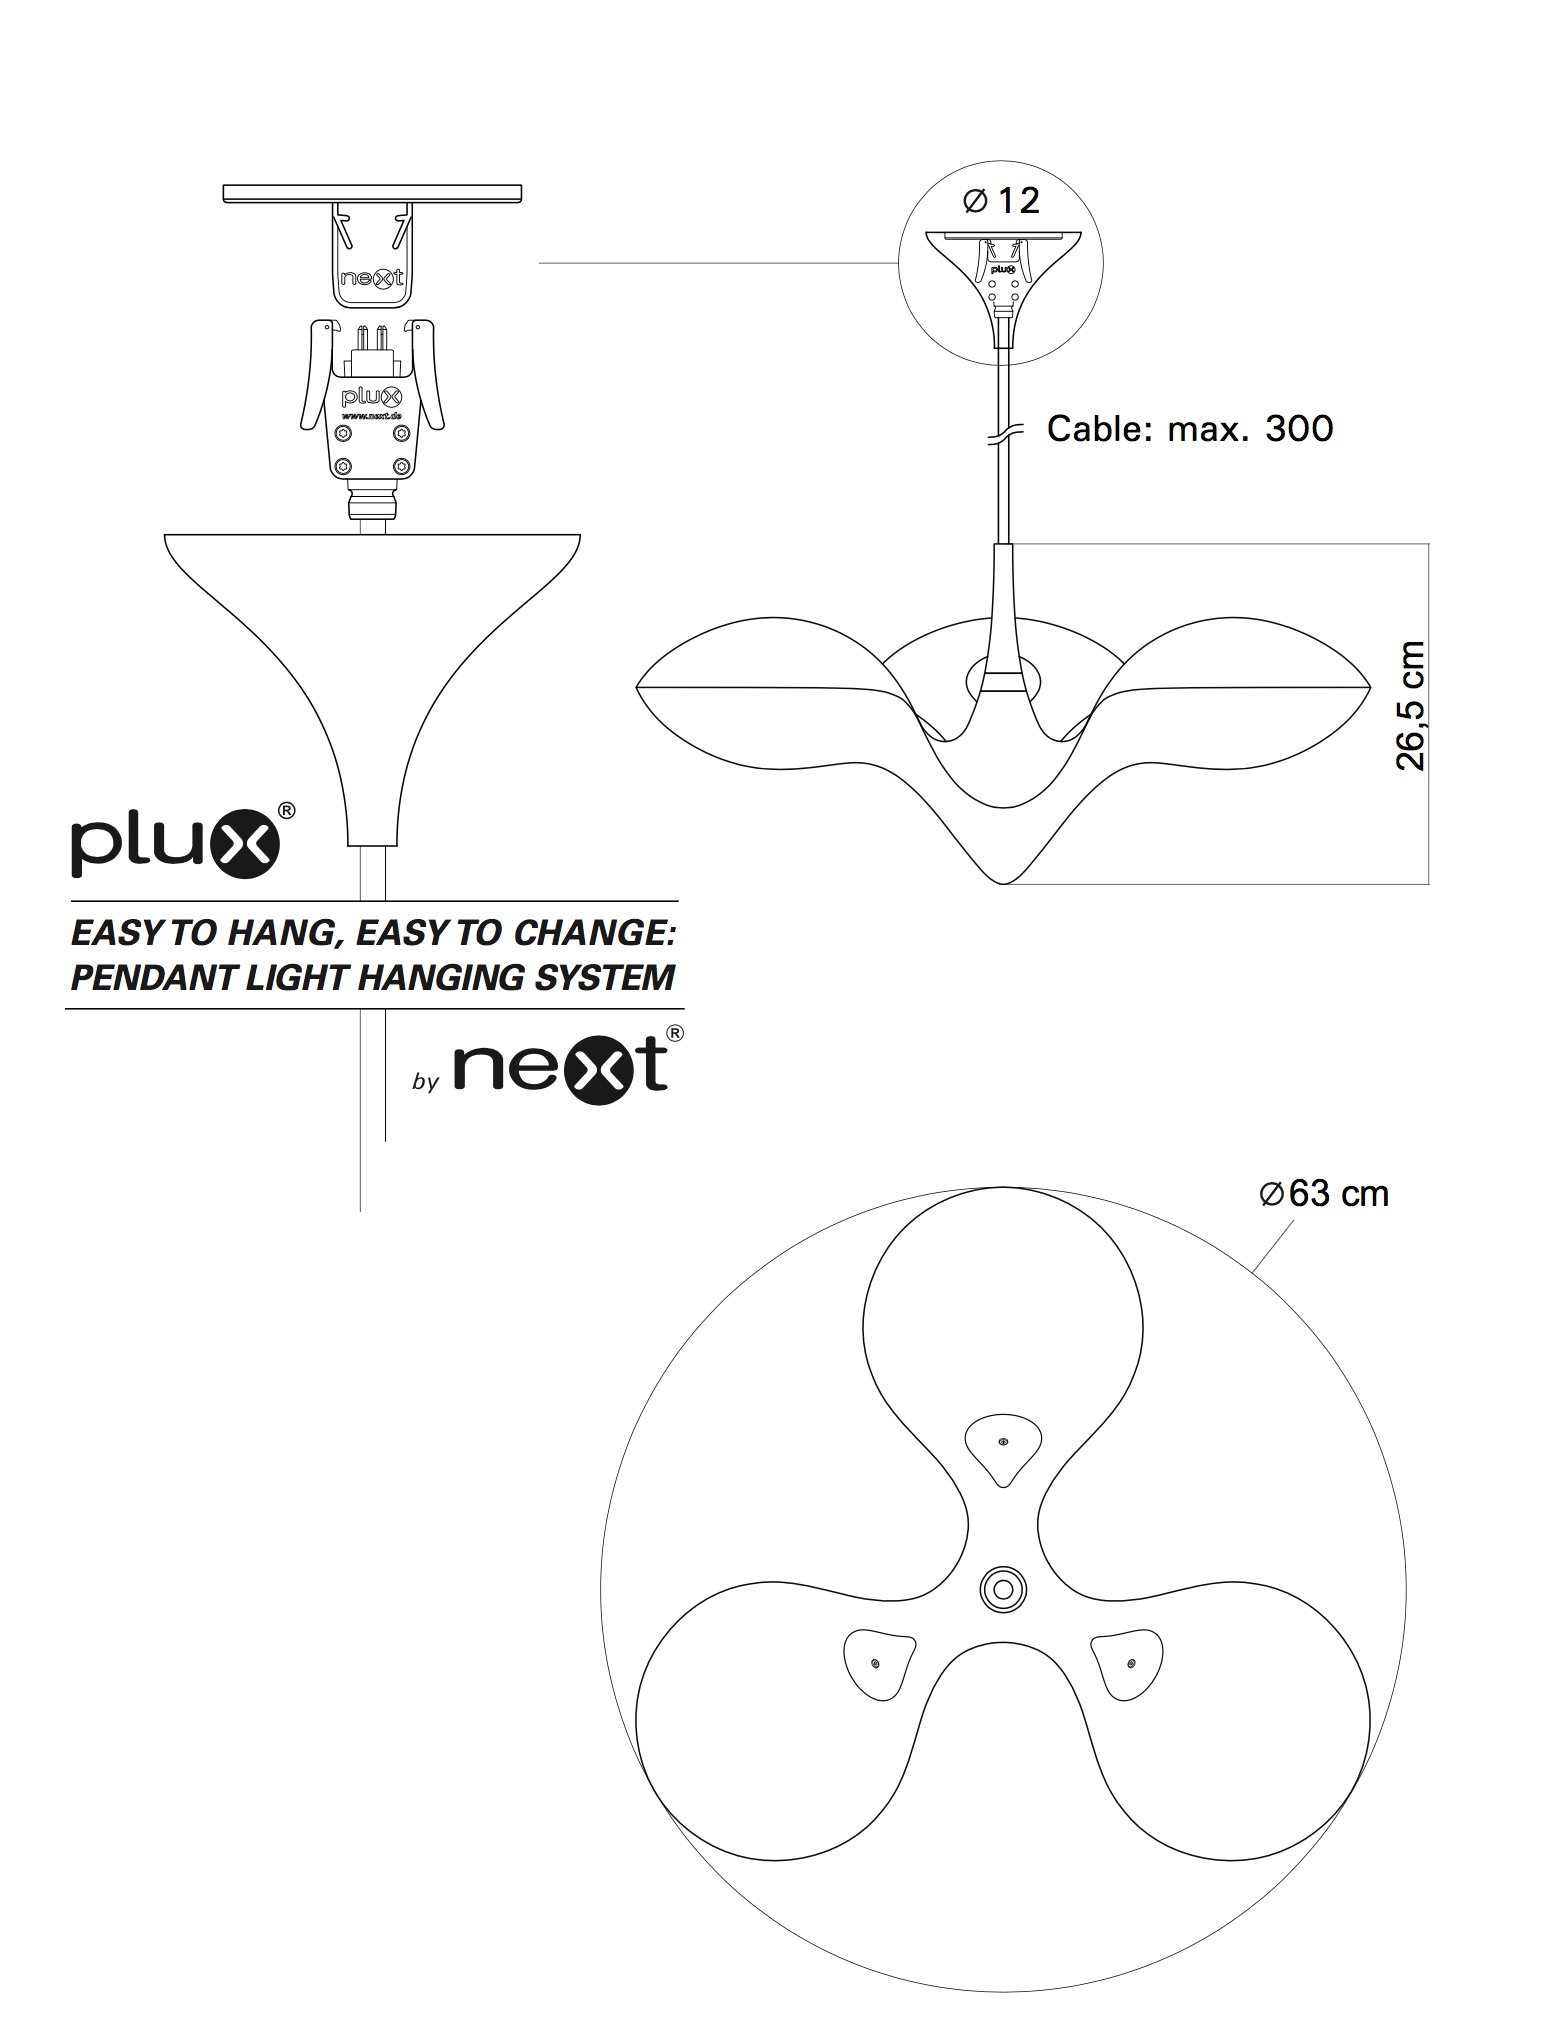 Next Enterprise Pendant Tech